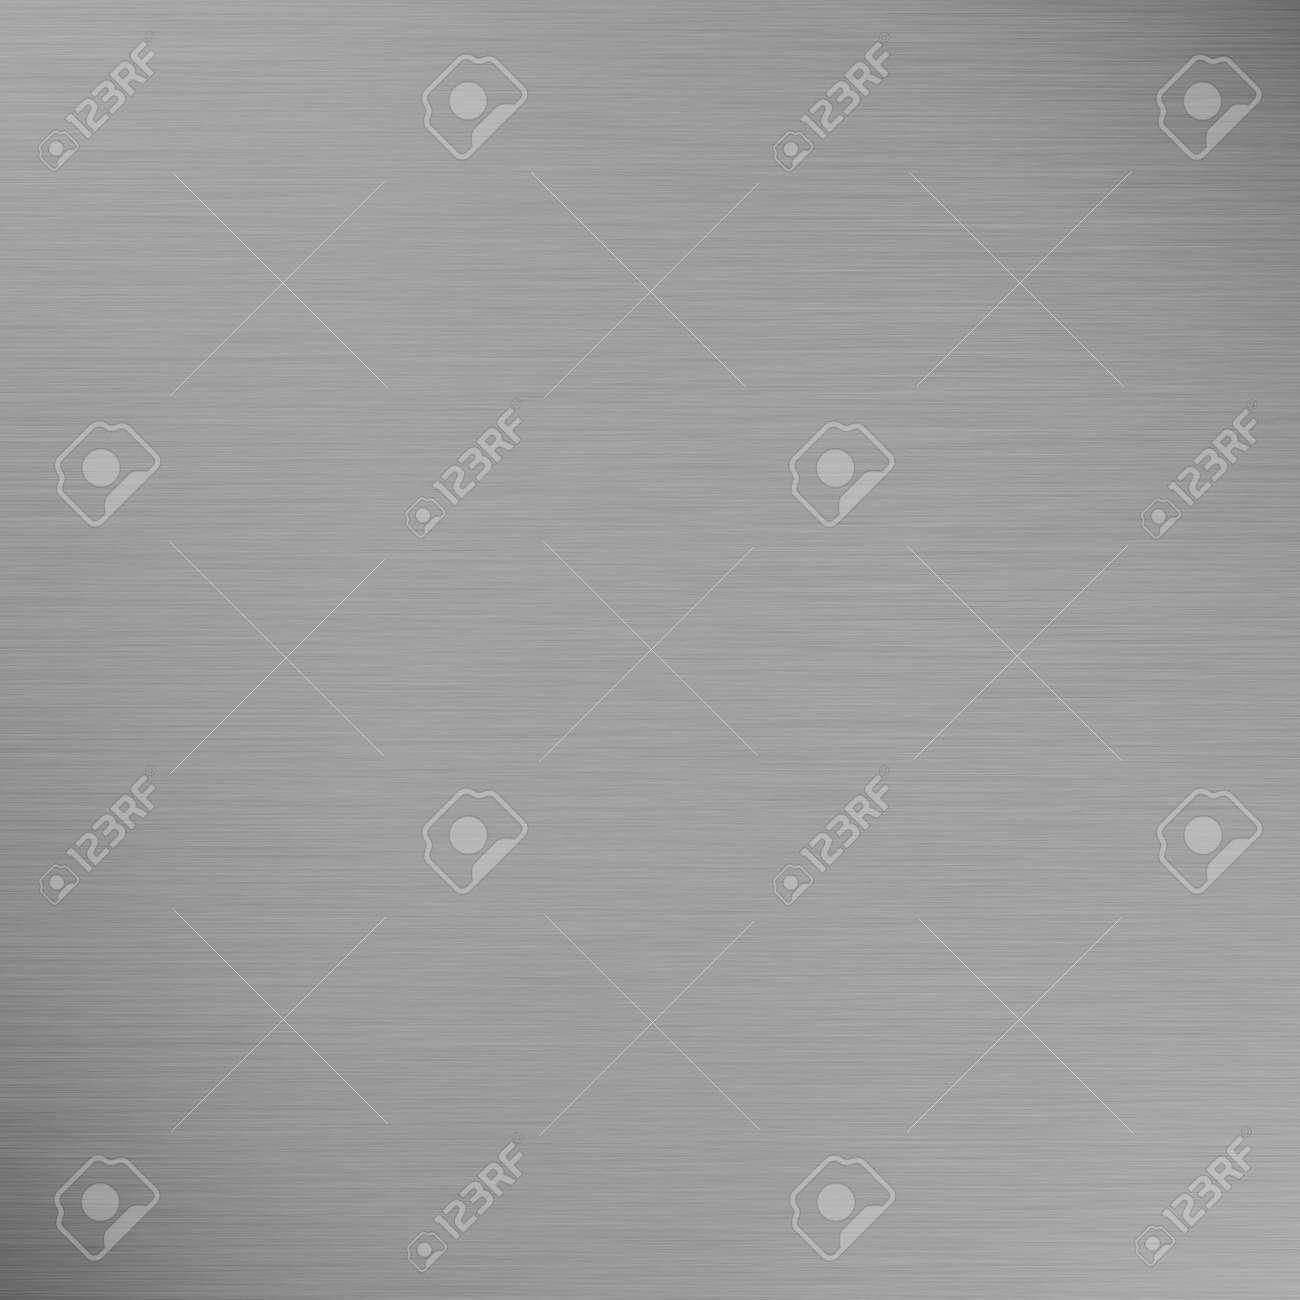 Brushed Metal Background Stock Photo - 14411893